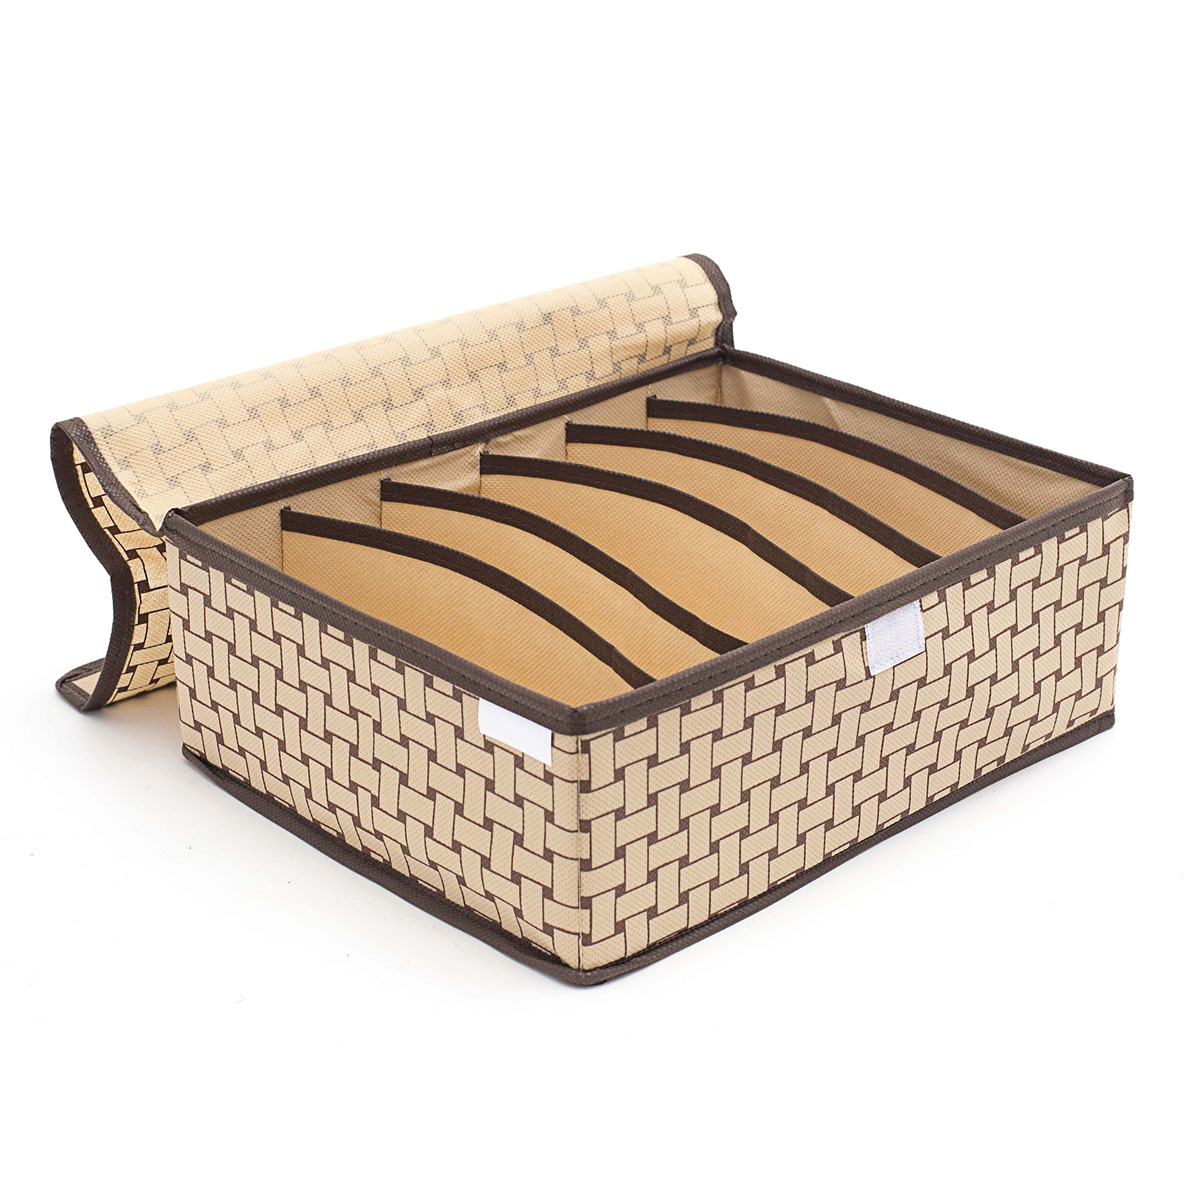 Органайзер для хранения вещей Homsu Pletenka, с крышкой, 6 секций, 31 х 24 х 11 см органайзер homsu hipster style 31 х 24 х 11 см hom 759